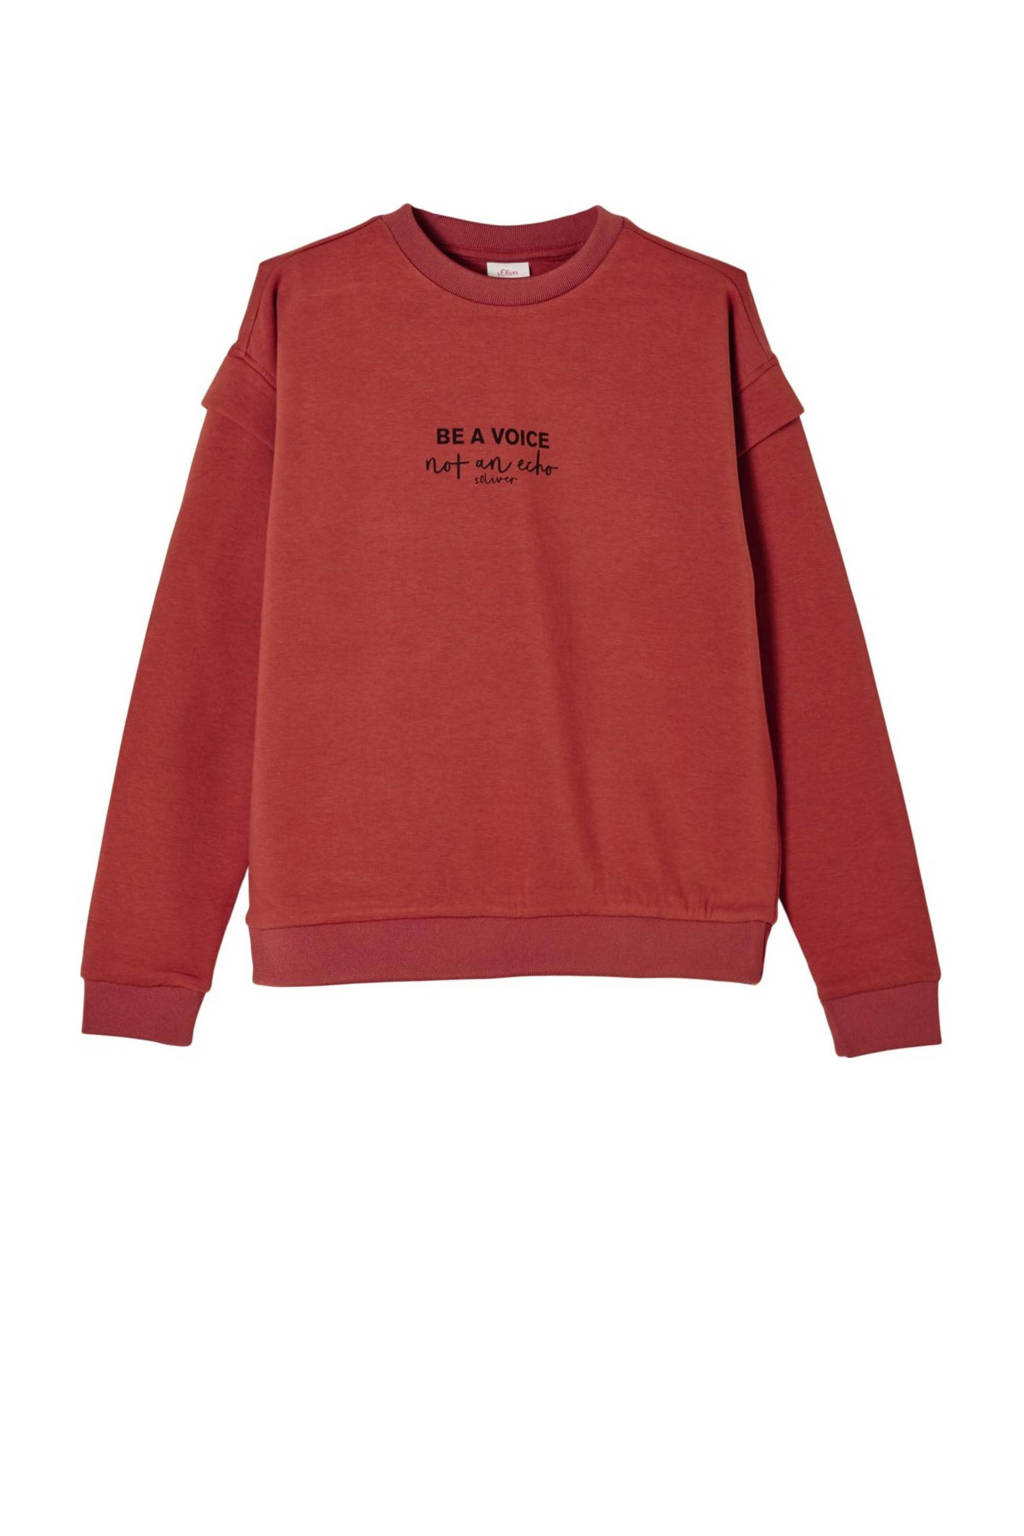 s.Oliver sweater met tekst roodbruin, Roodbruin